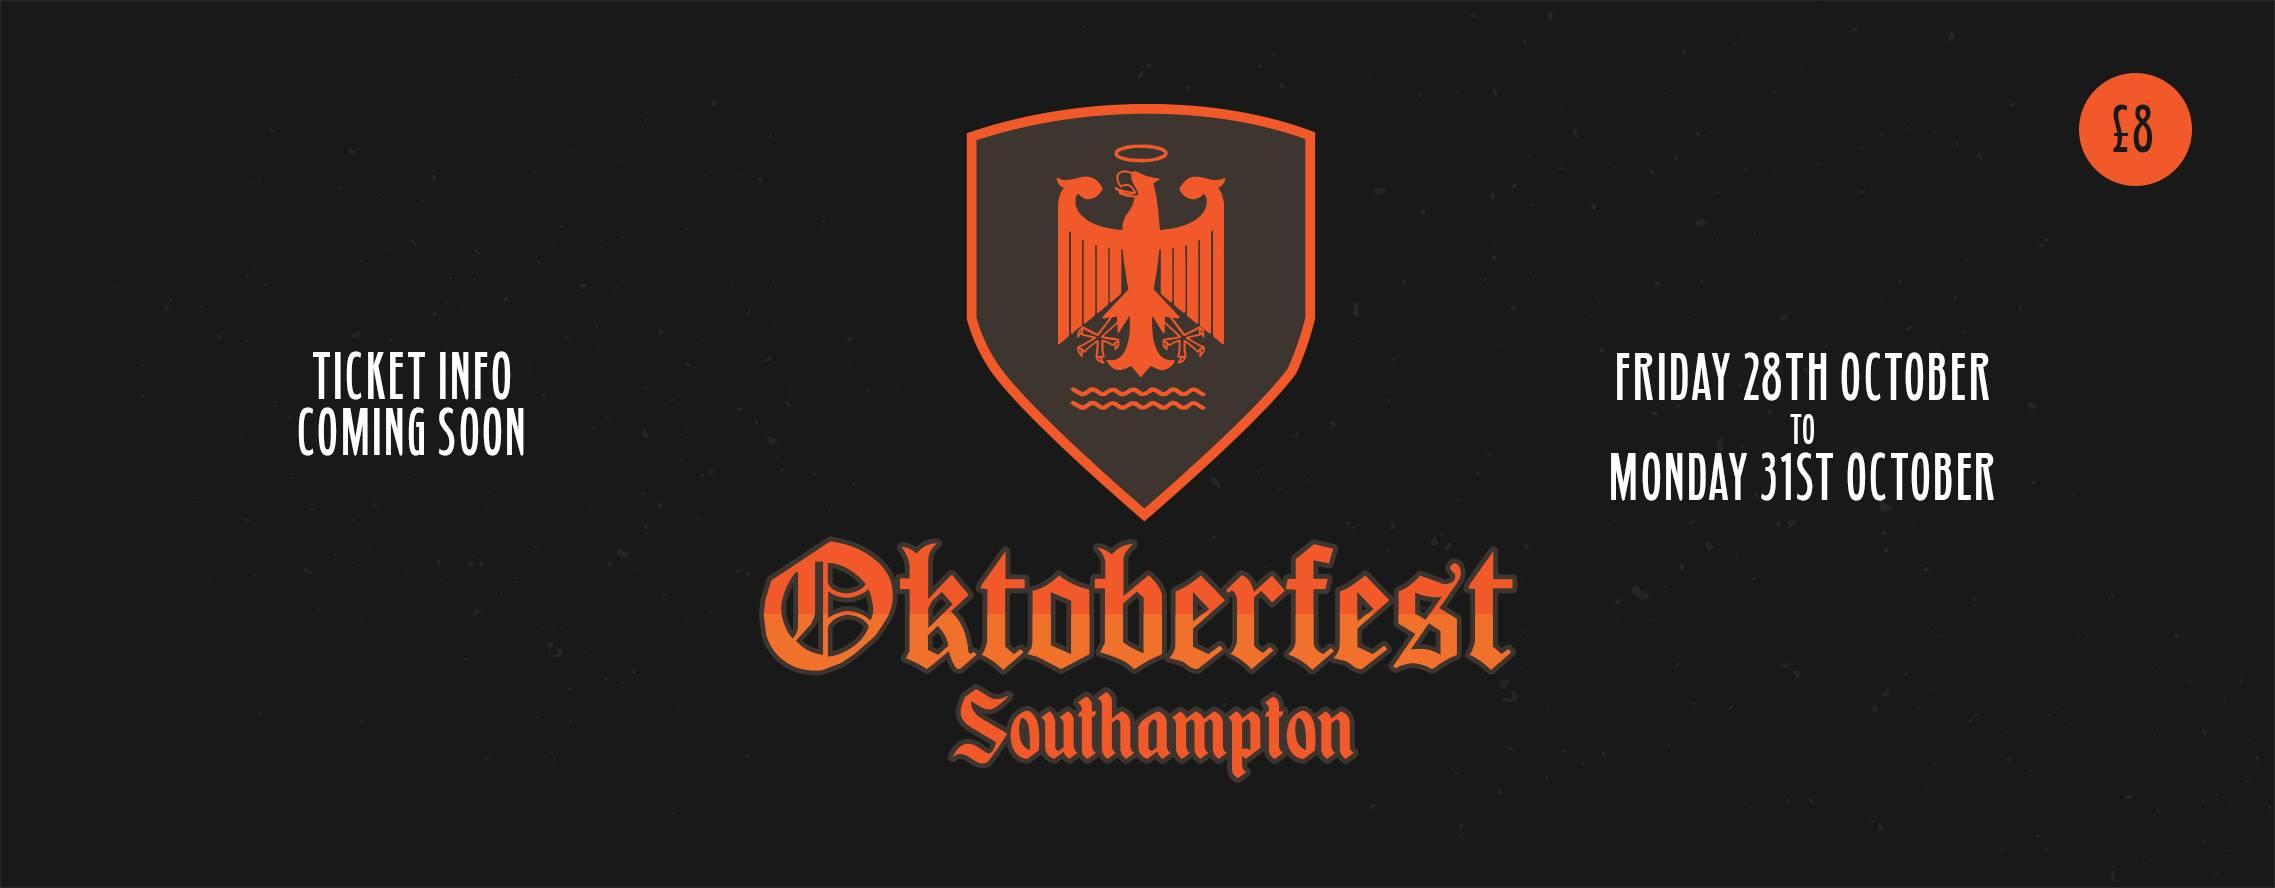 Oktoberfest Southampton